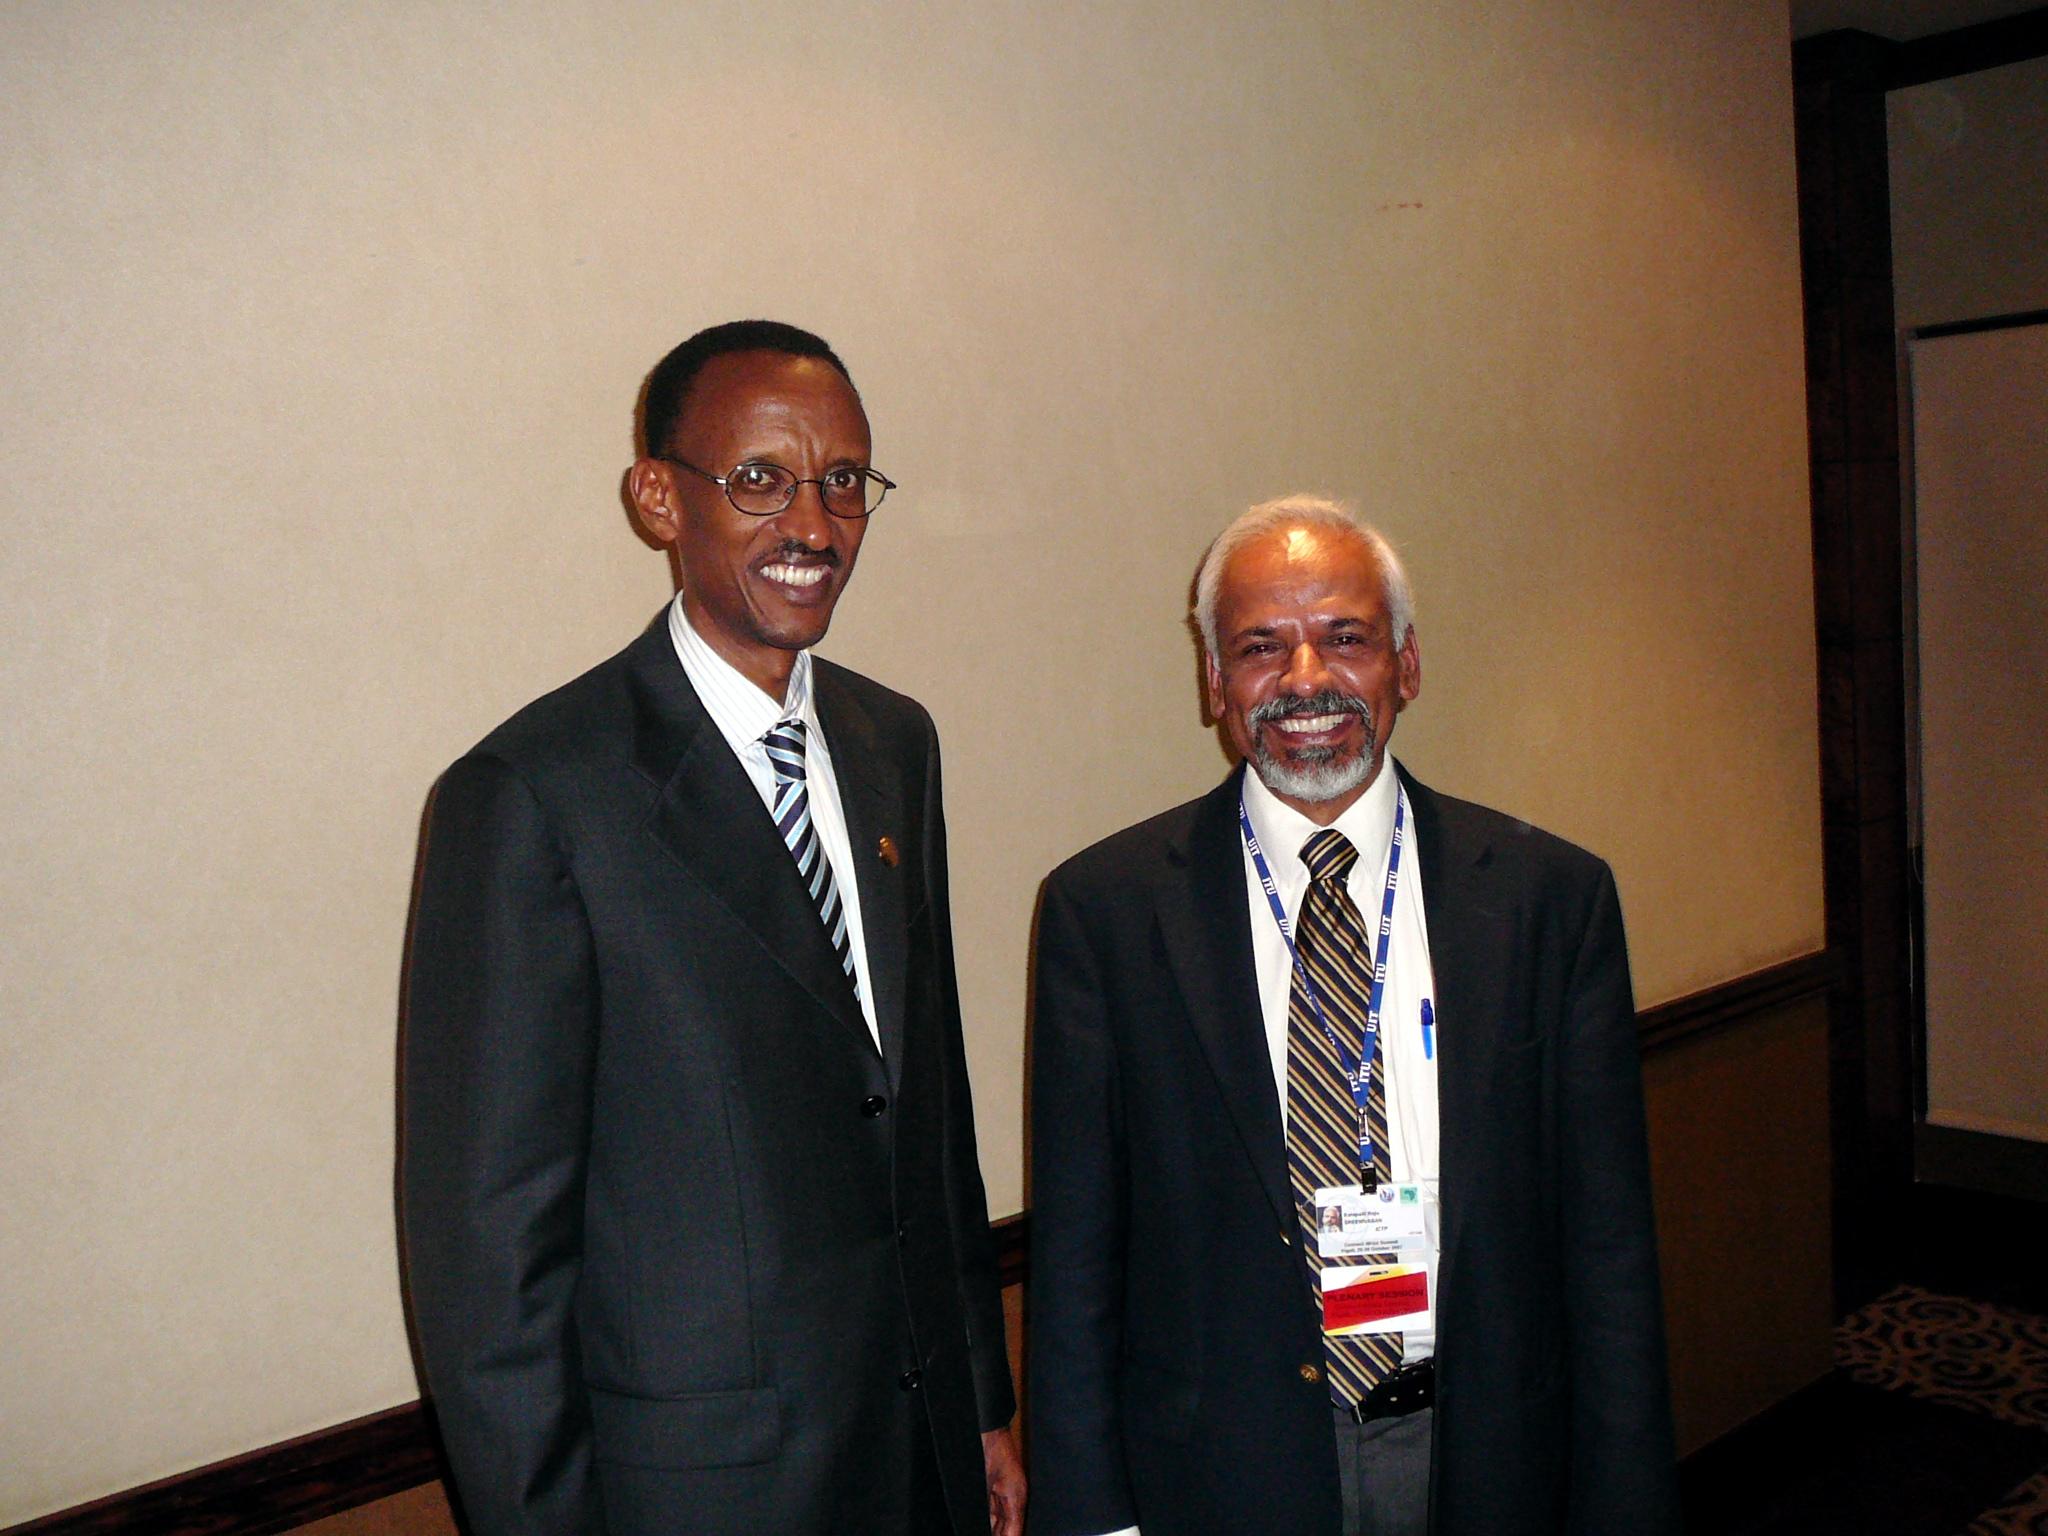 President of Rwanda Paul Kagame and K.R. Sreenivasan